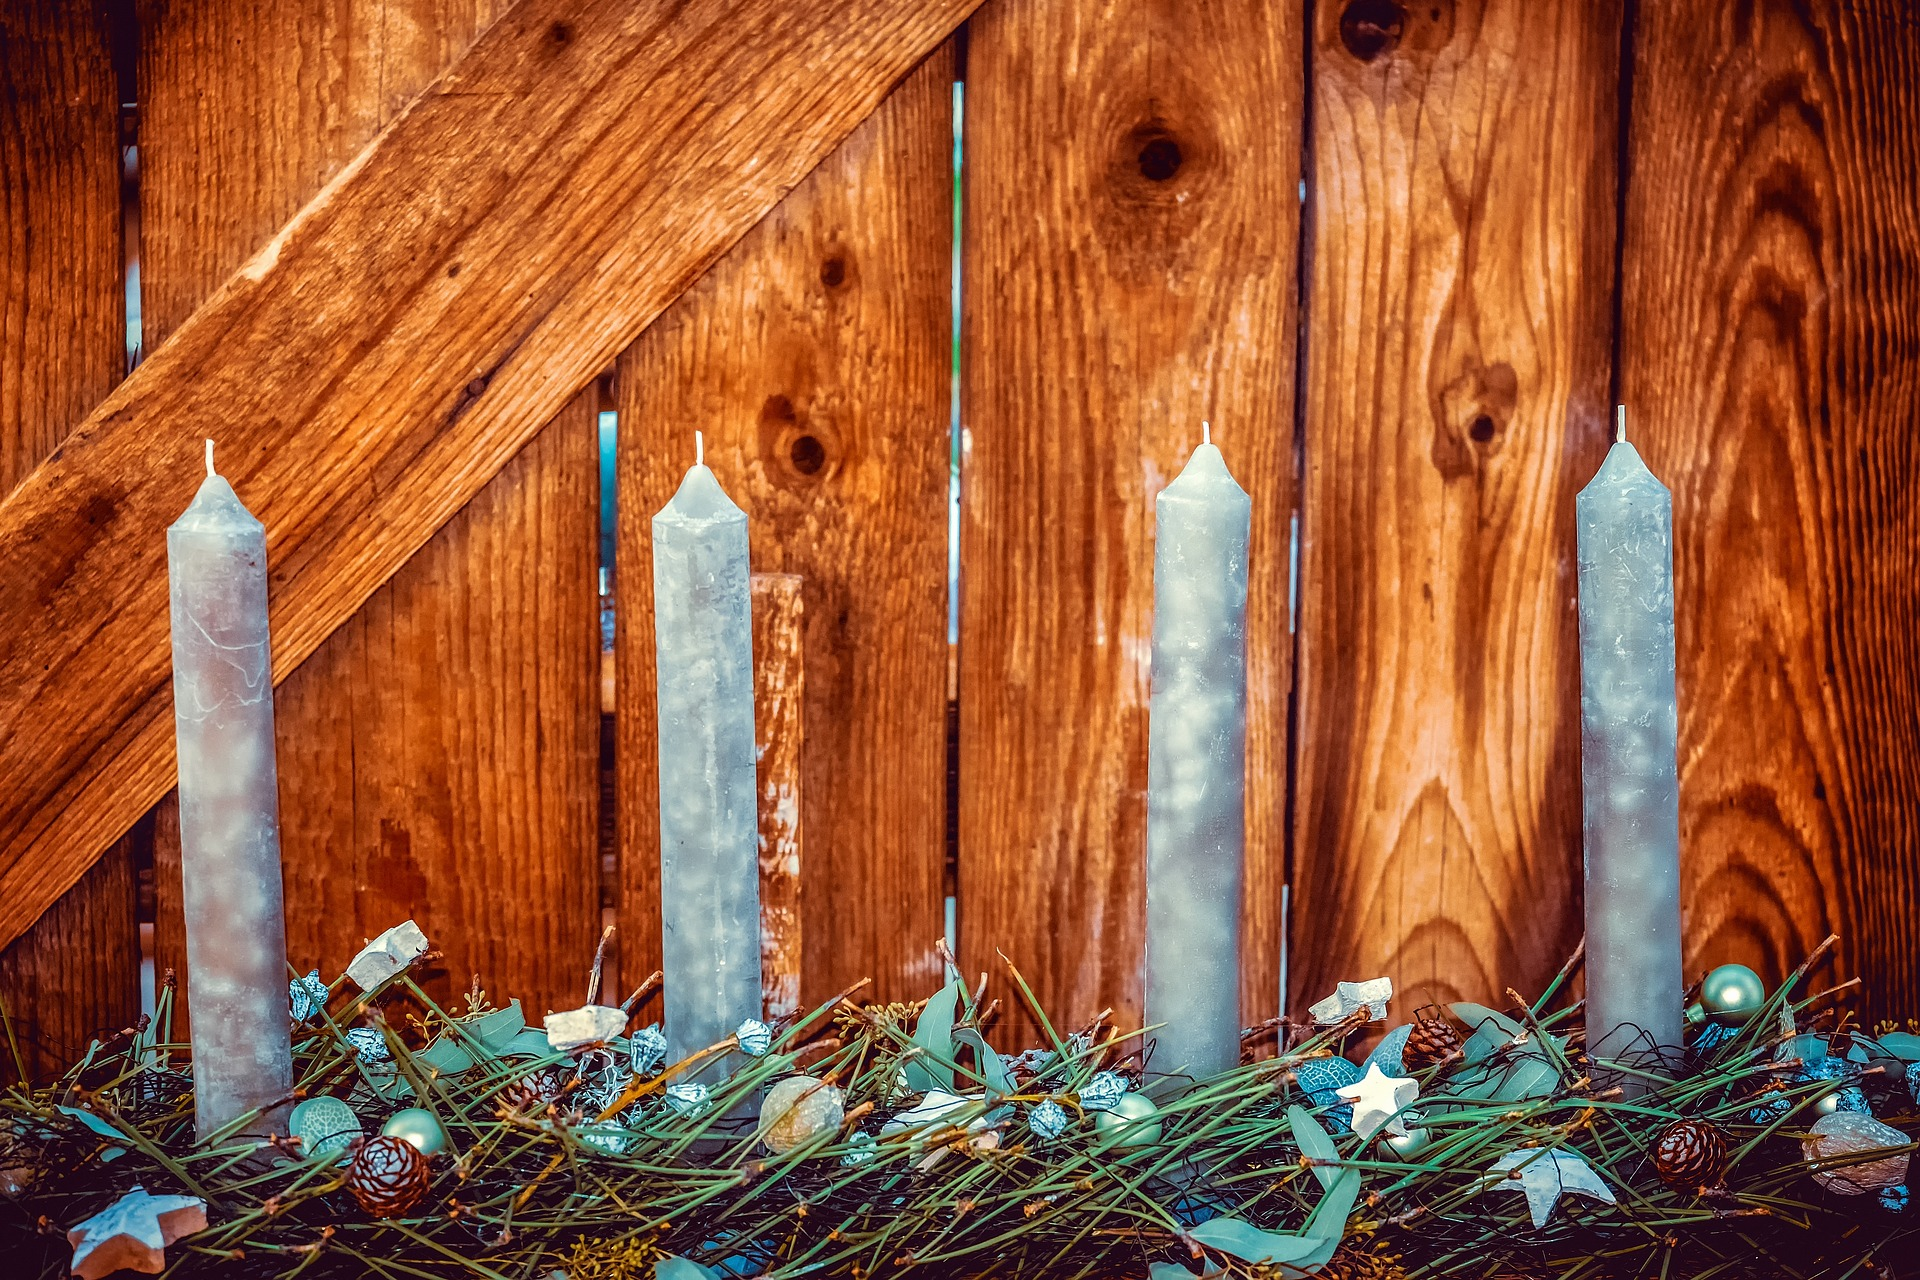 advent-wreath-3832699_1920.jpg